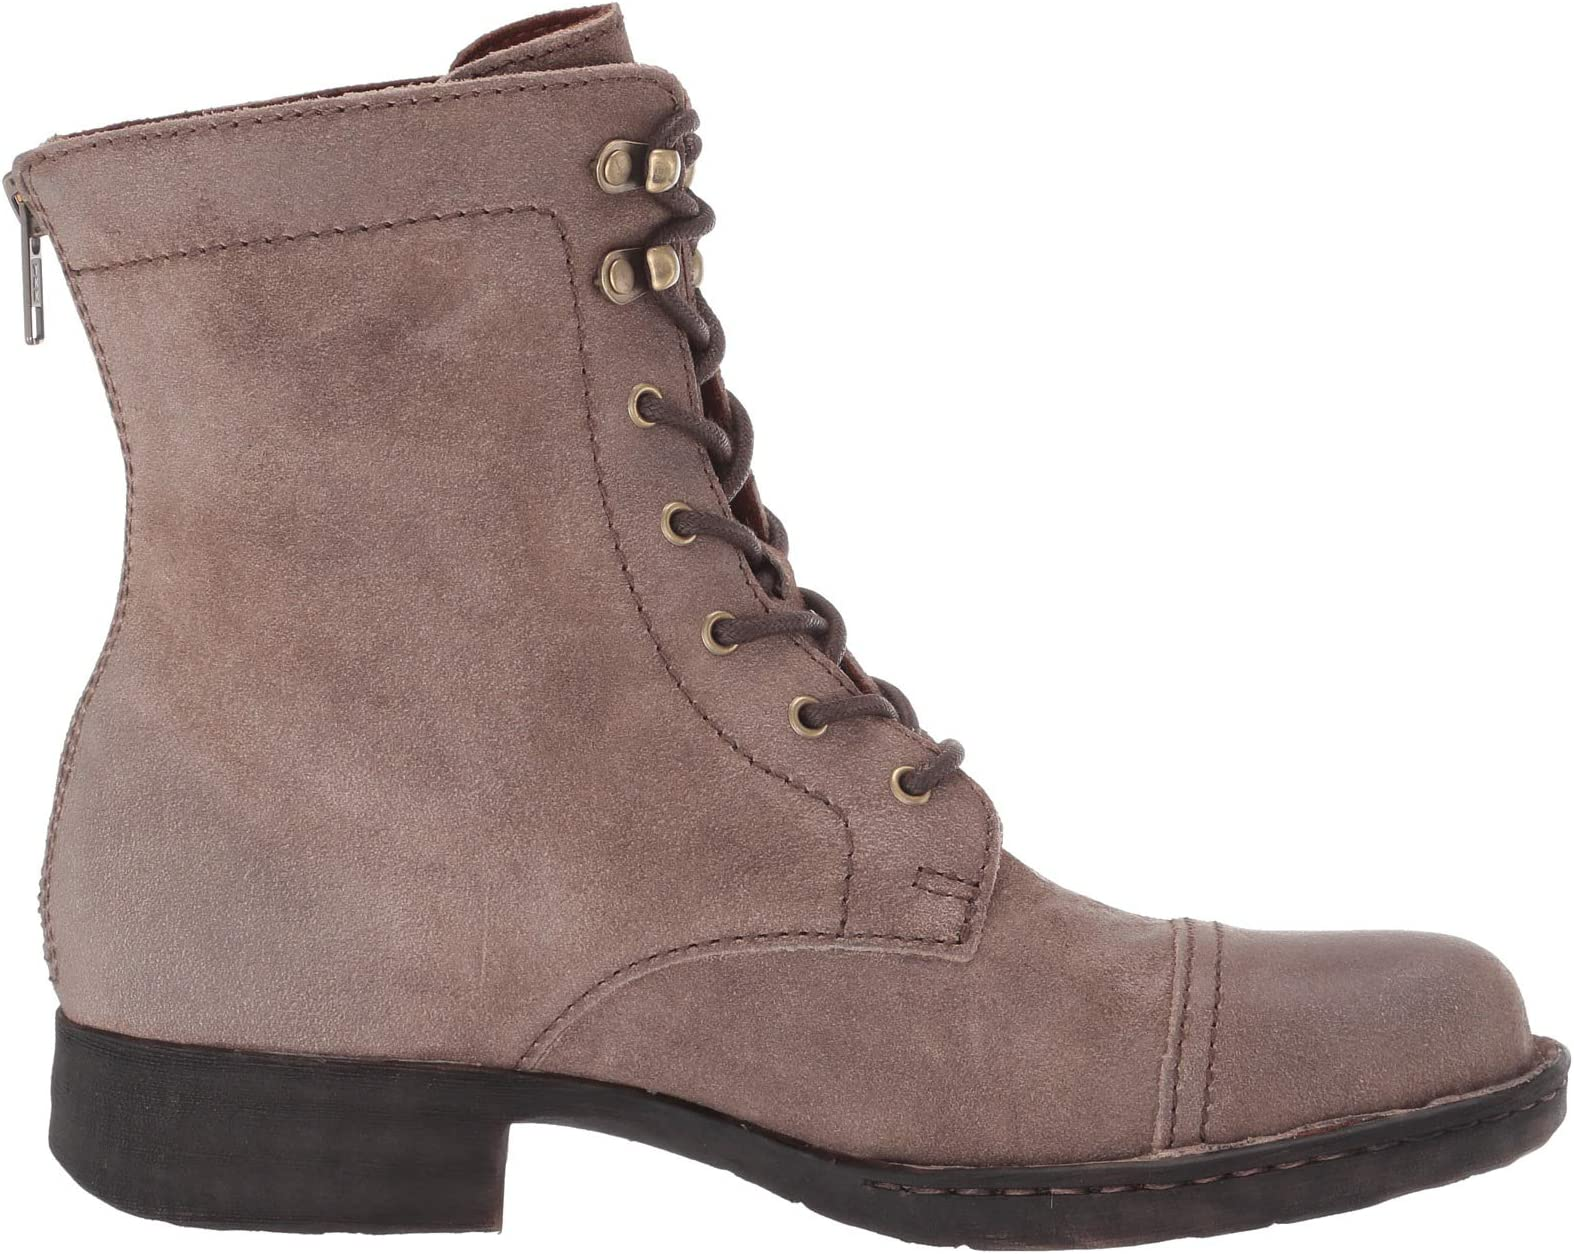 Born Kelisa   Women's shoes   2020 Newest